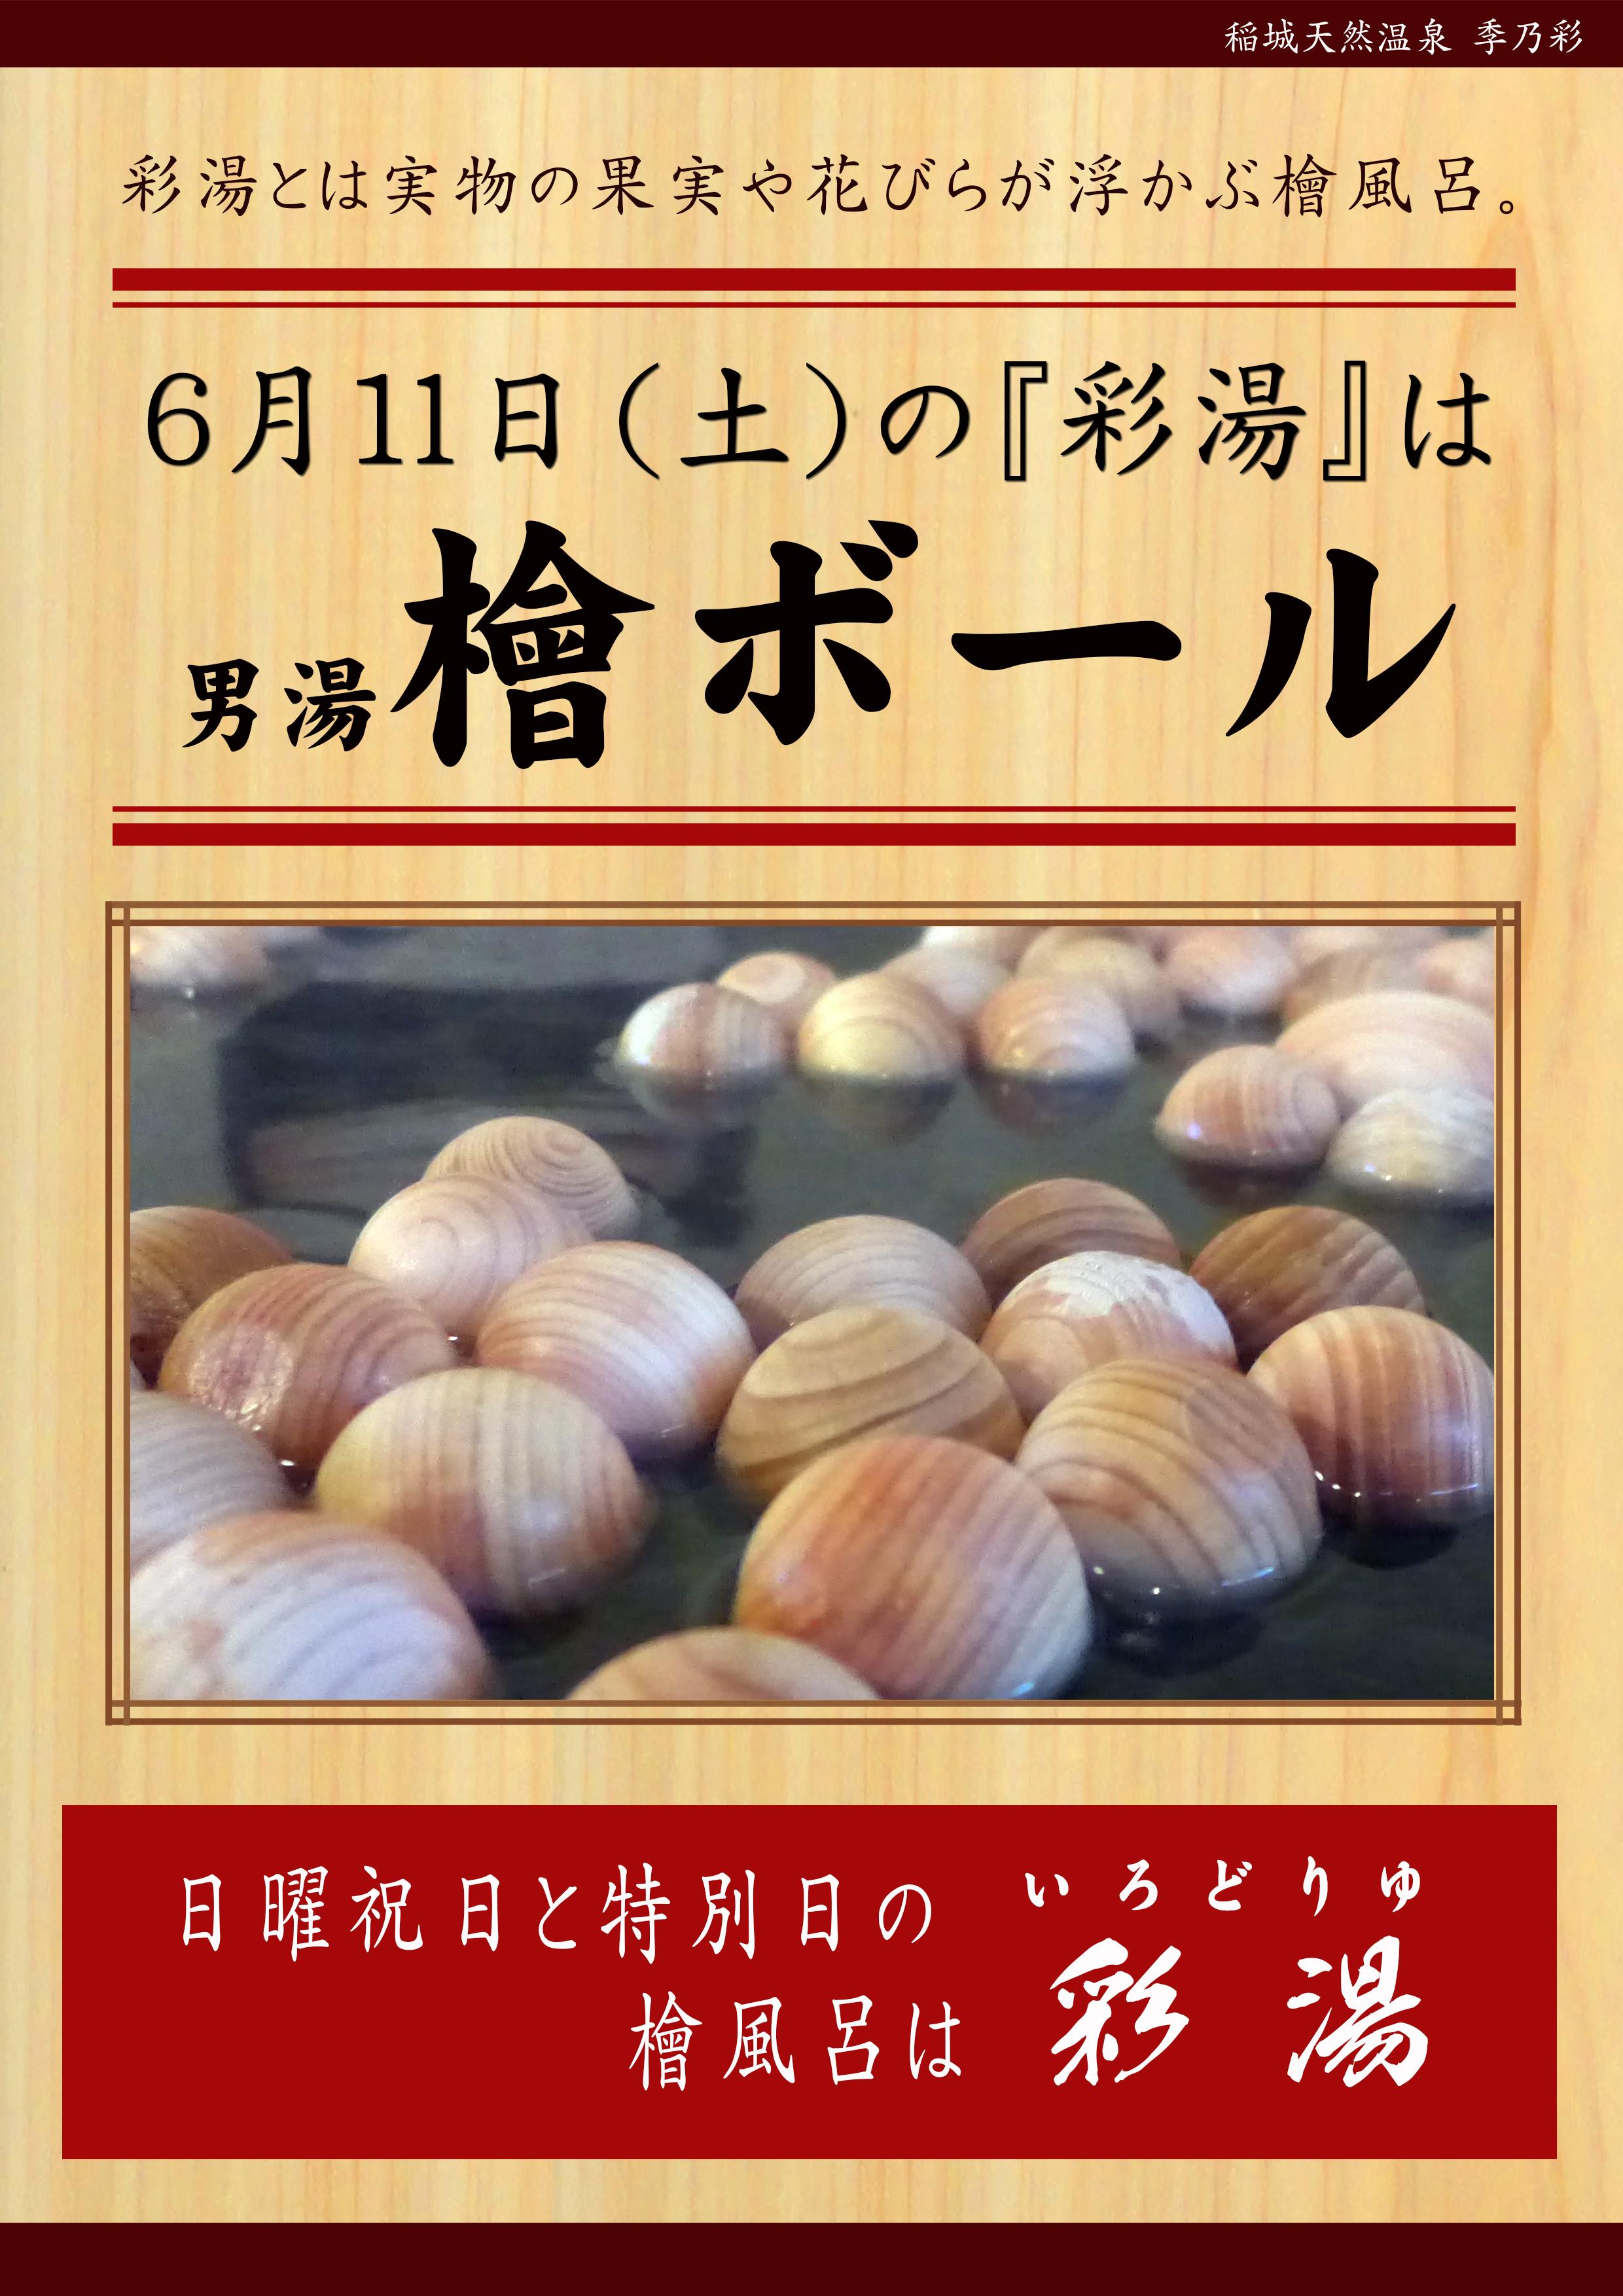 20160611 POP イベント 彩湯 男湯 檜ボール